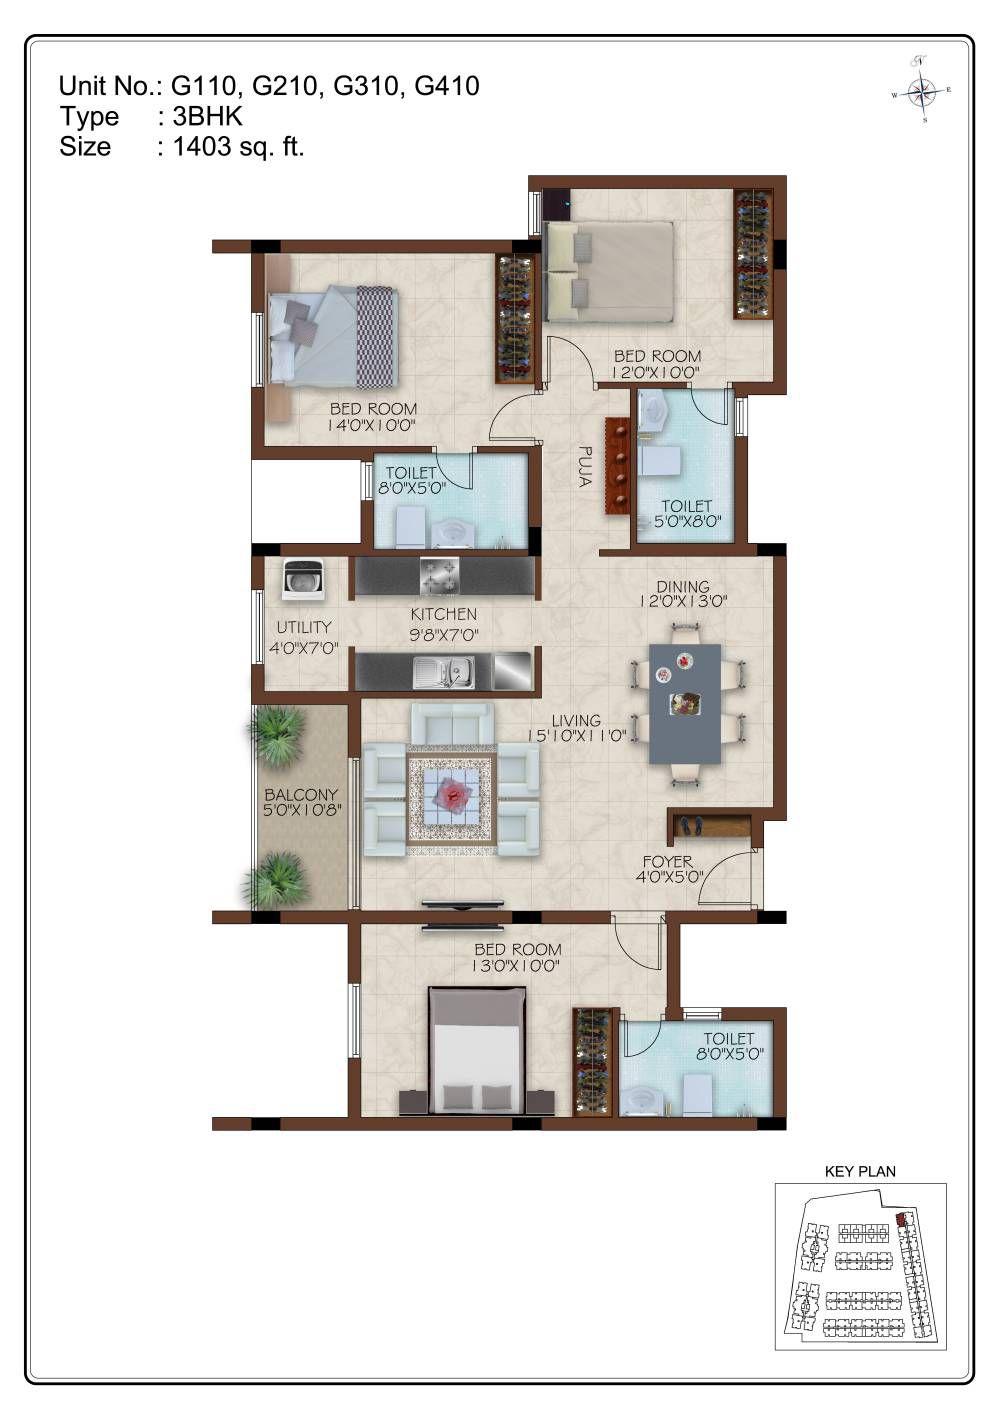 Luxury Apartments For Sale In Alandur Chennai Godrej Washing Machine Wiring Diagram Floor Plans Site Plan 2 Bhk 3 4